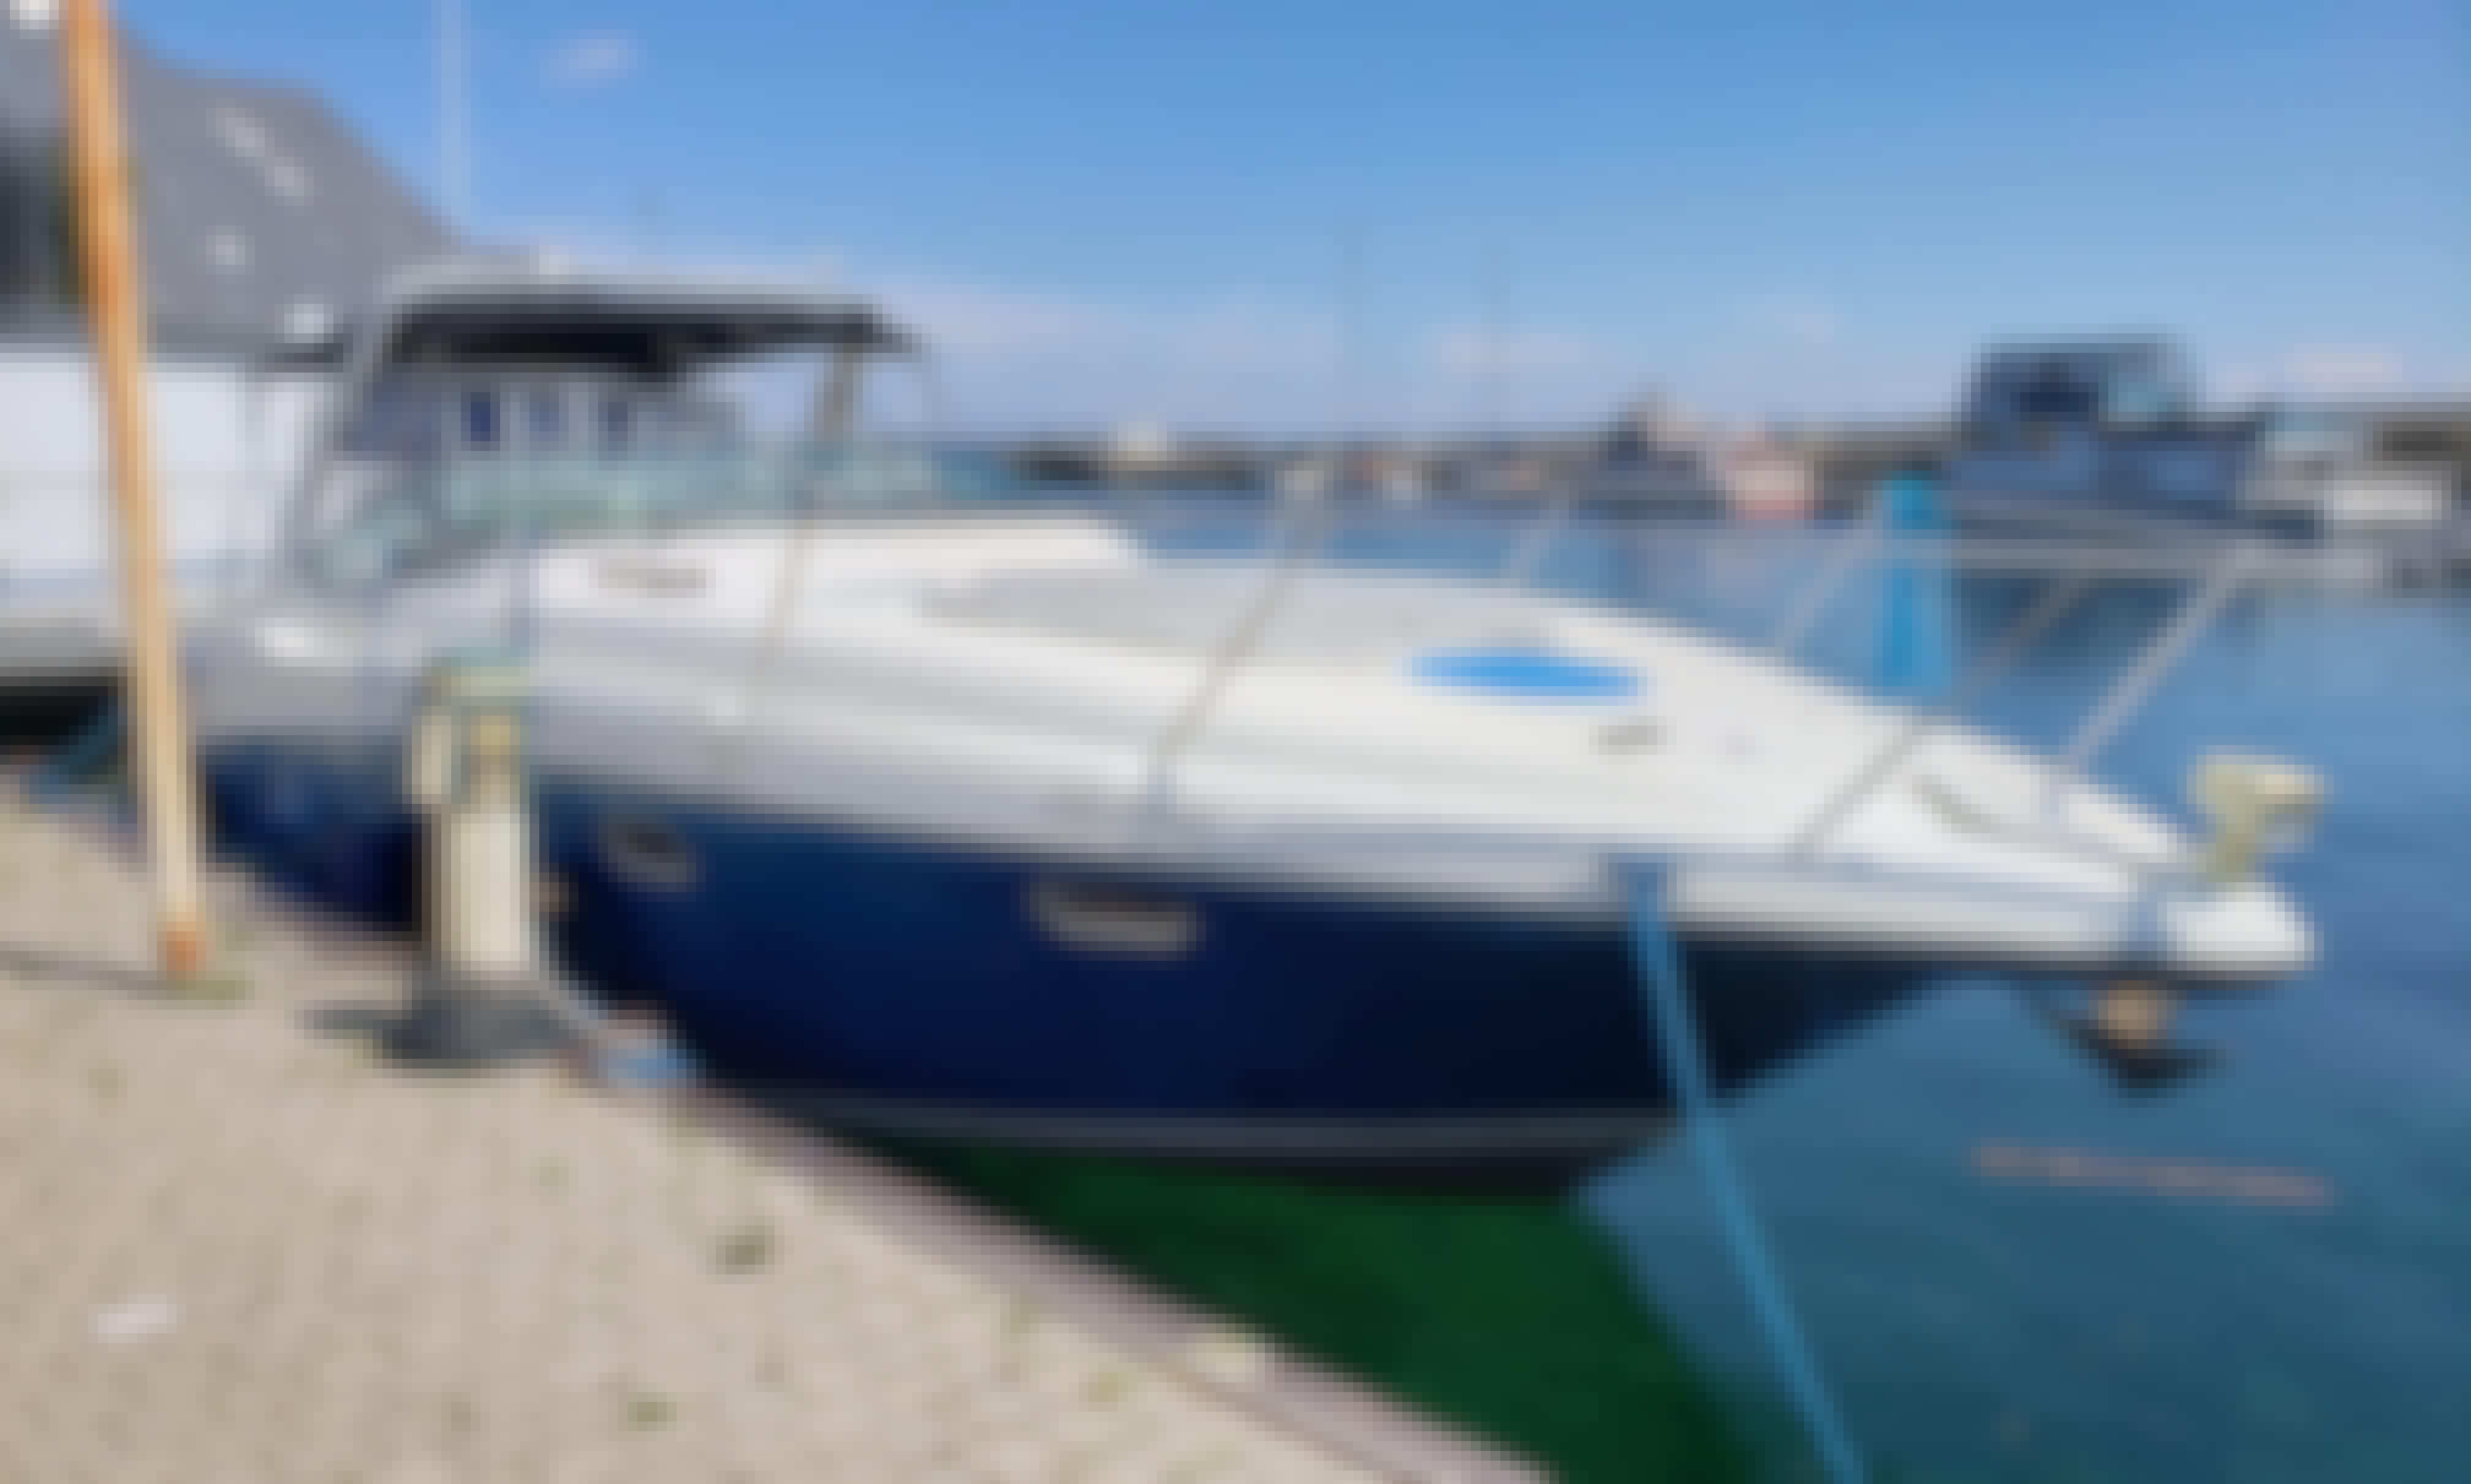 Motor Yacht Rental in Toronto, Ontario